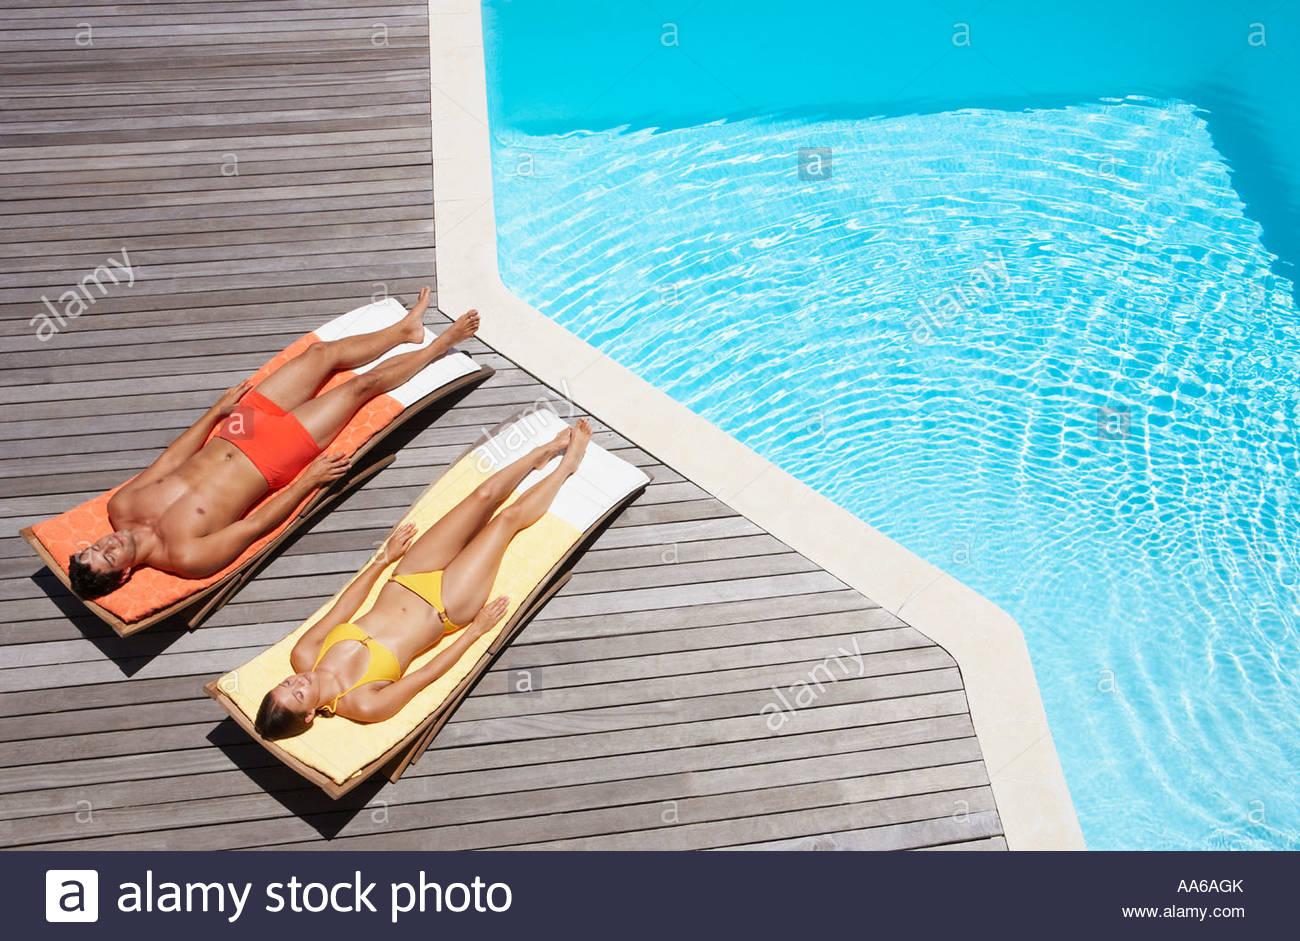 Man and woman sunbathing on pool deck - Stock Image